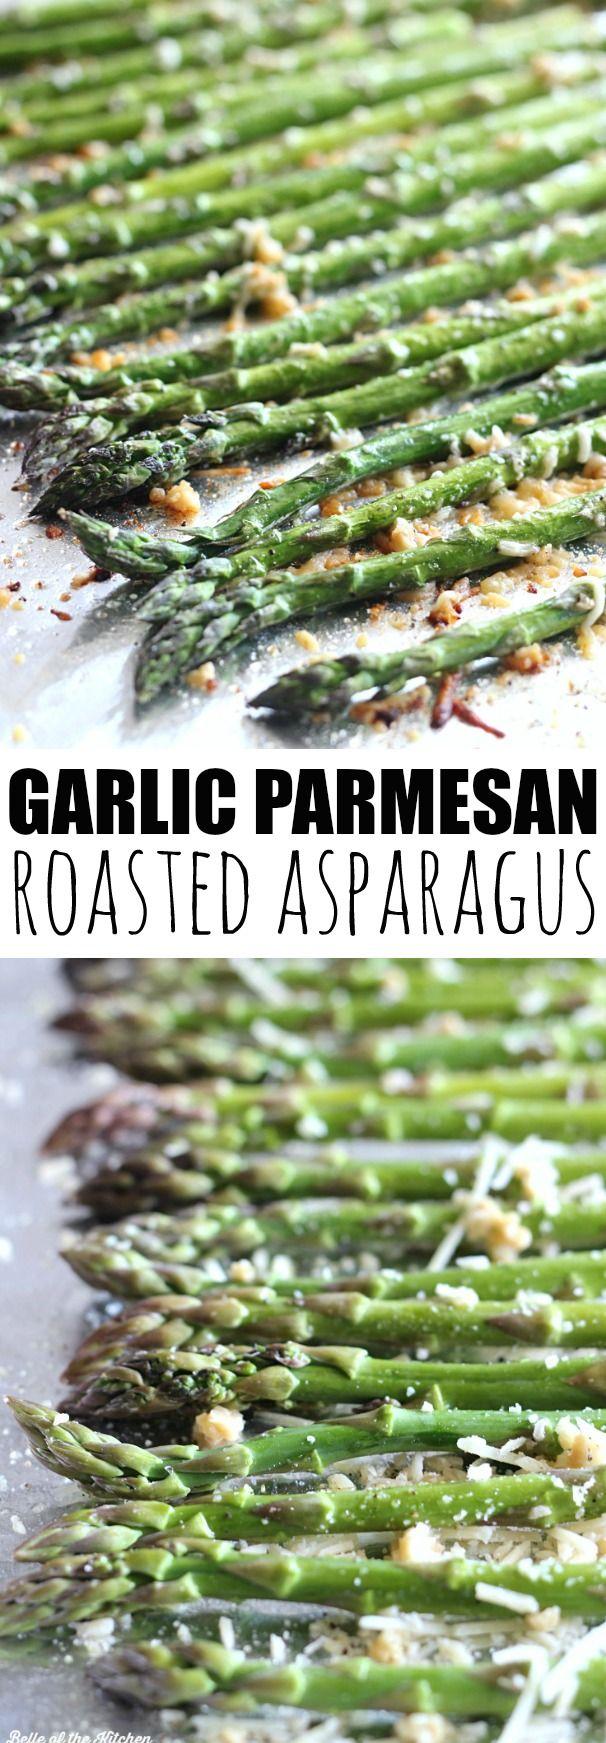 Garlic Parmesan Roasted Asparagus Roast